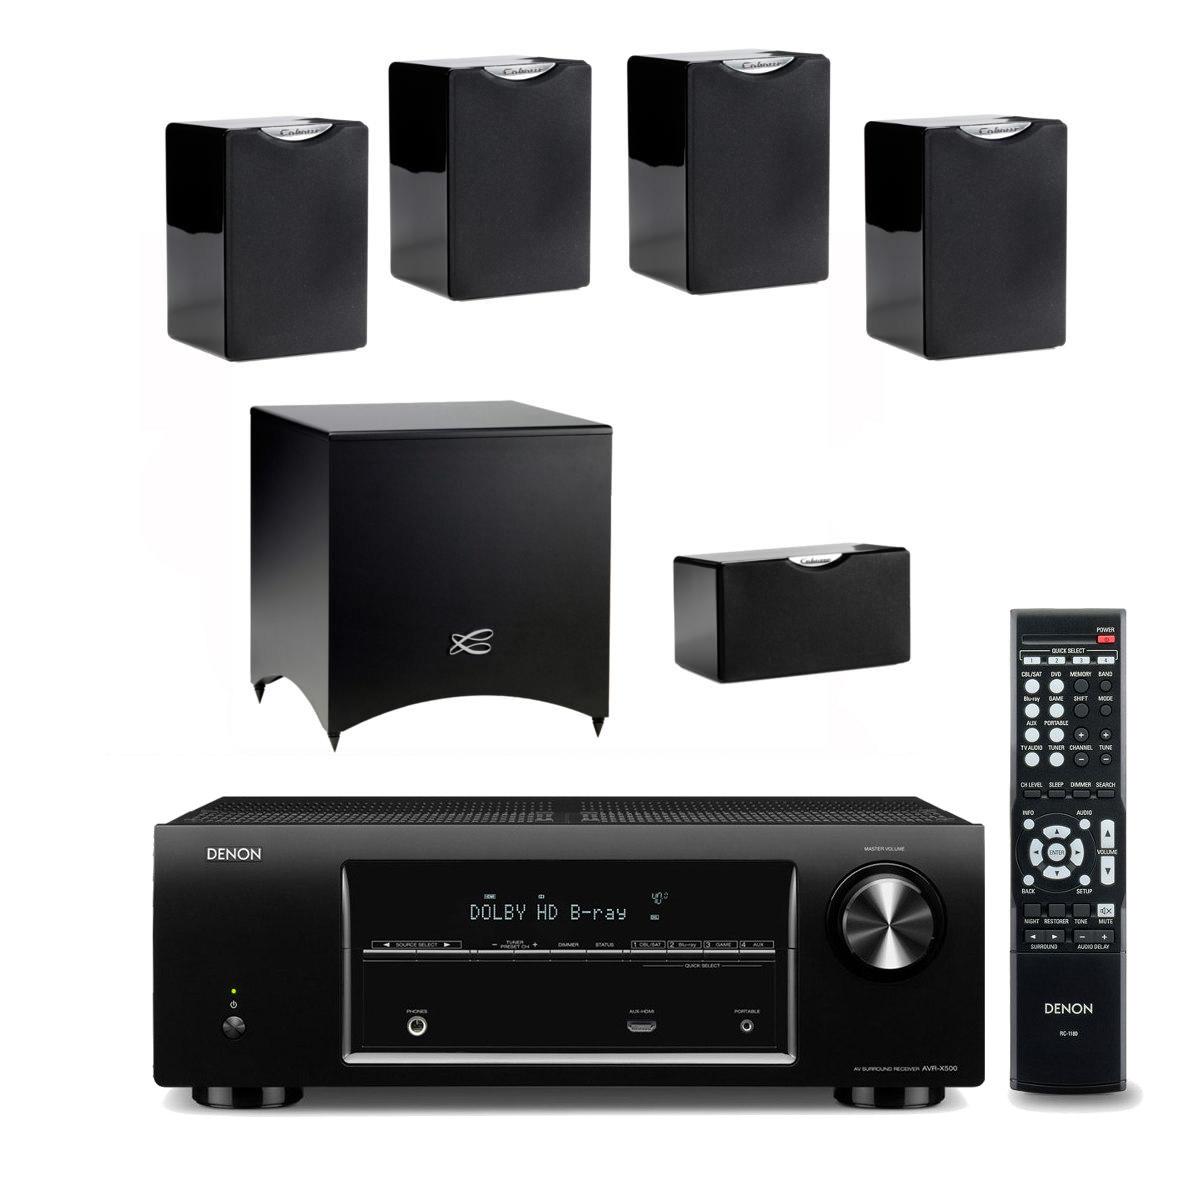 denon avr x500 cabasse pack fidji 5 1 noir ensemble. Black Bedroom Furniture Sets. Home Design Ideas